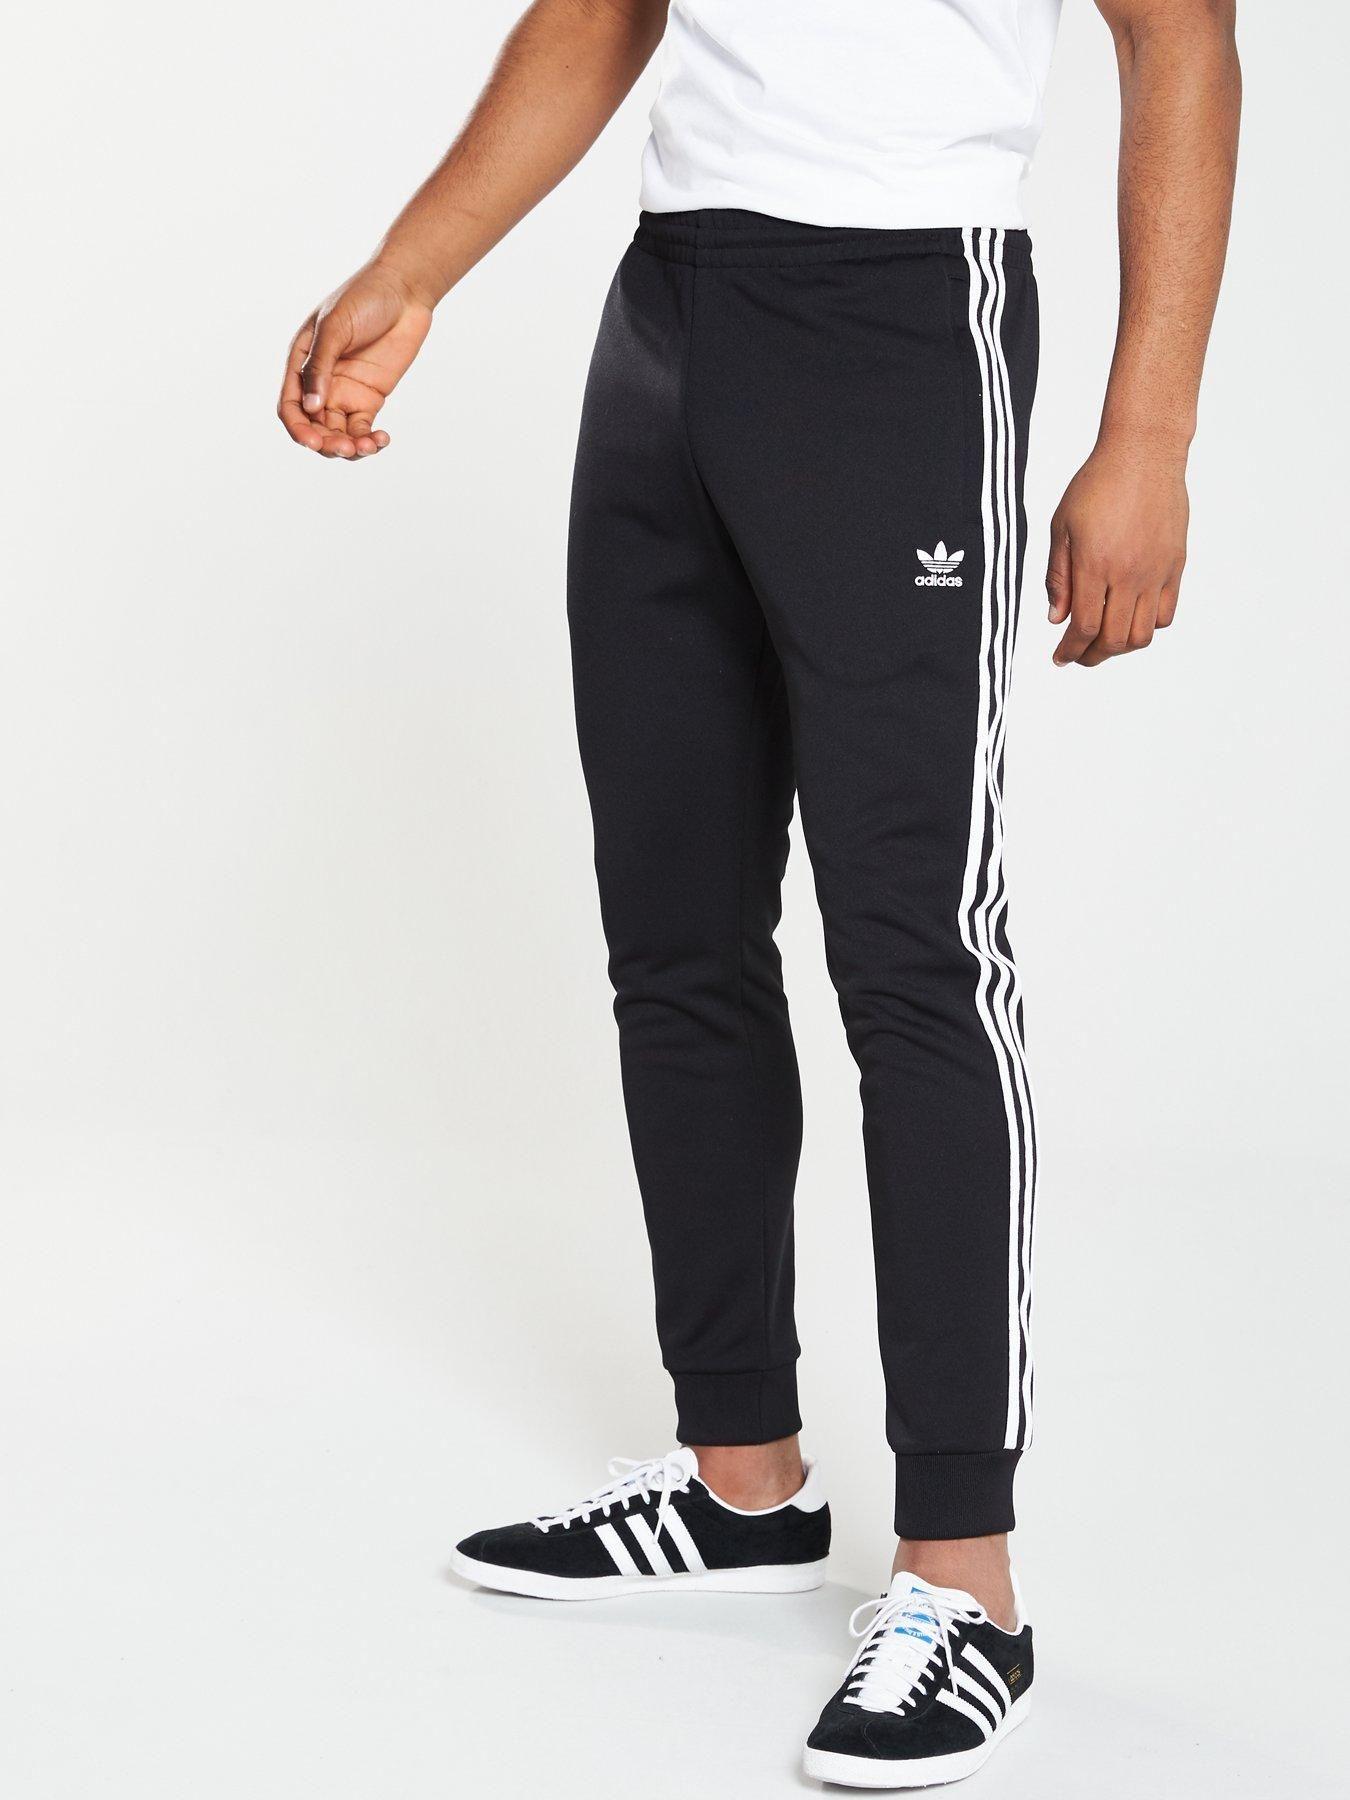 adidas superstar pants